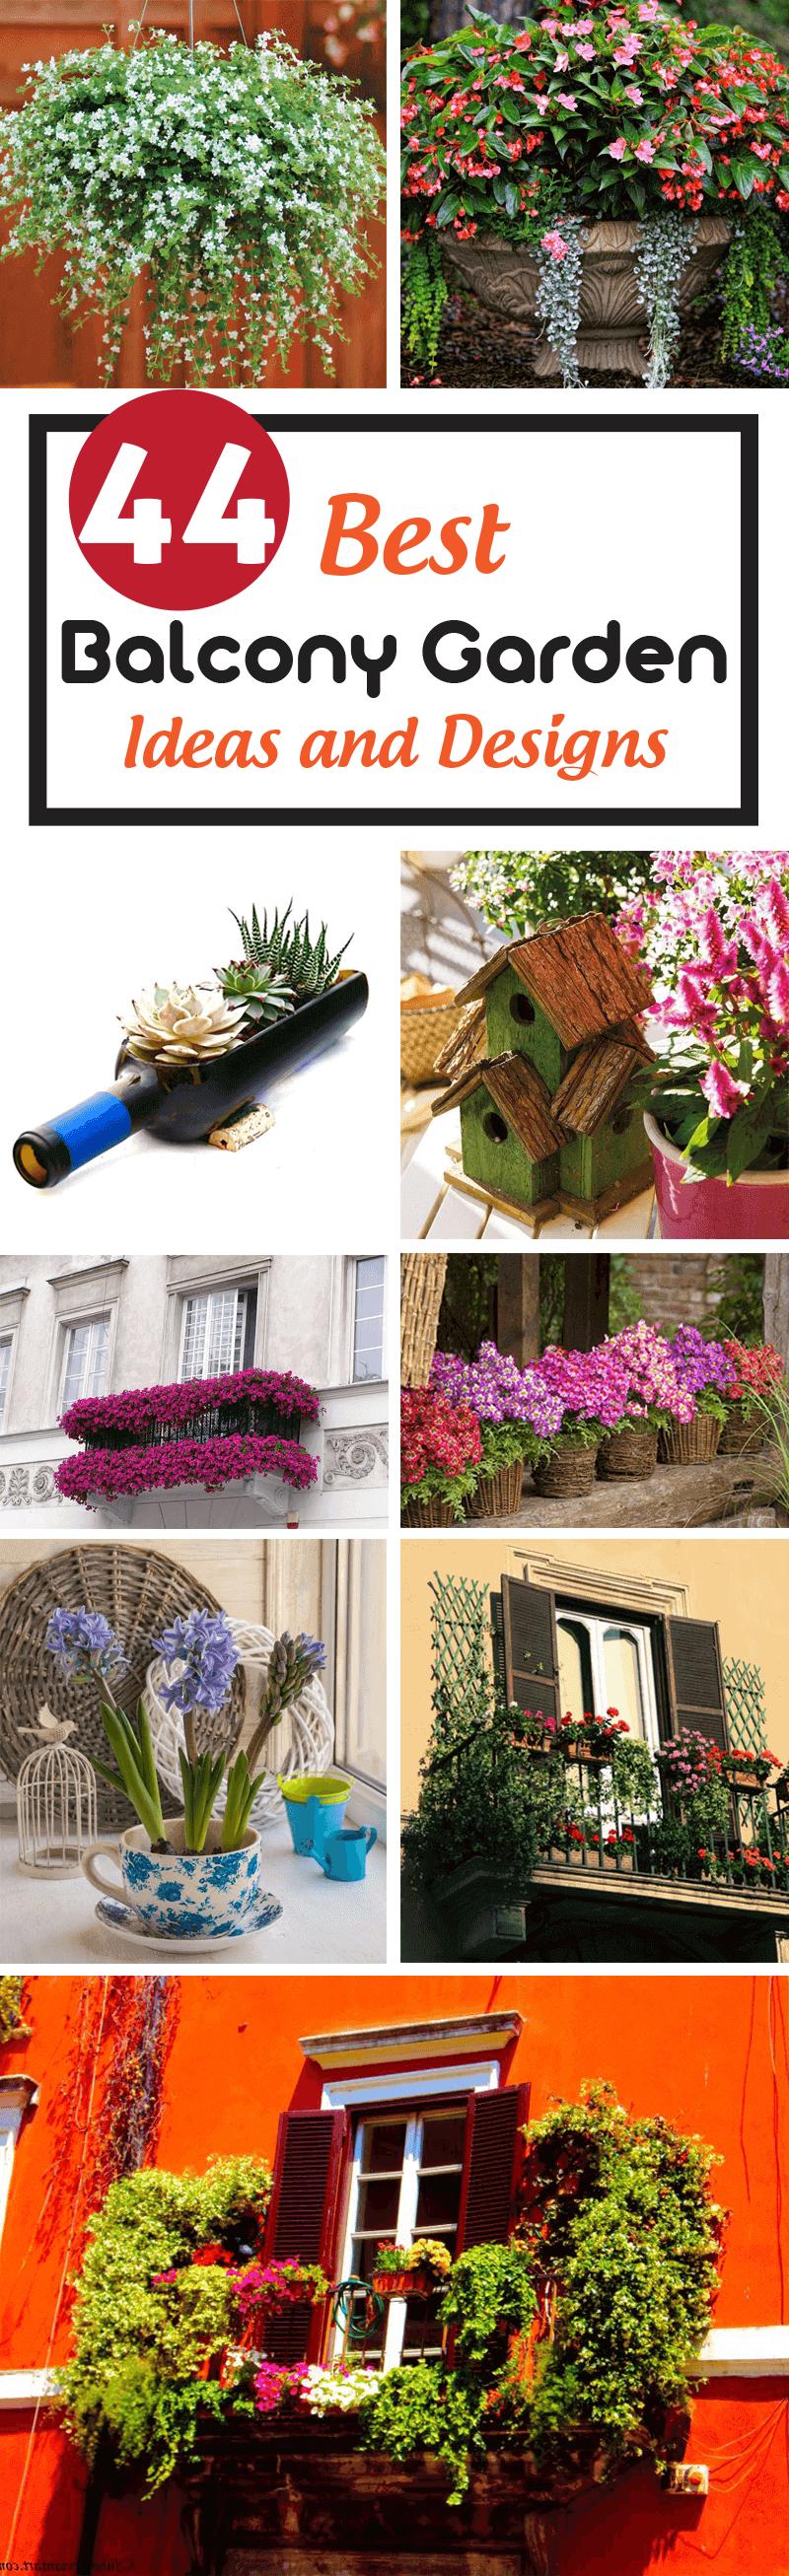 best balcony garden ideas and designs